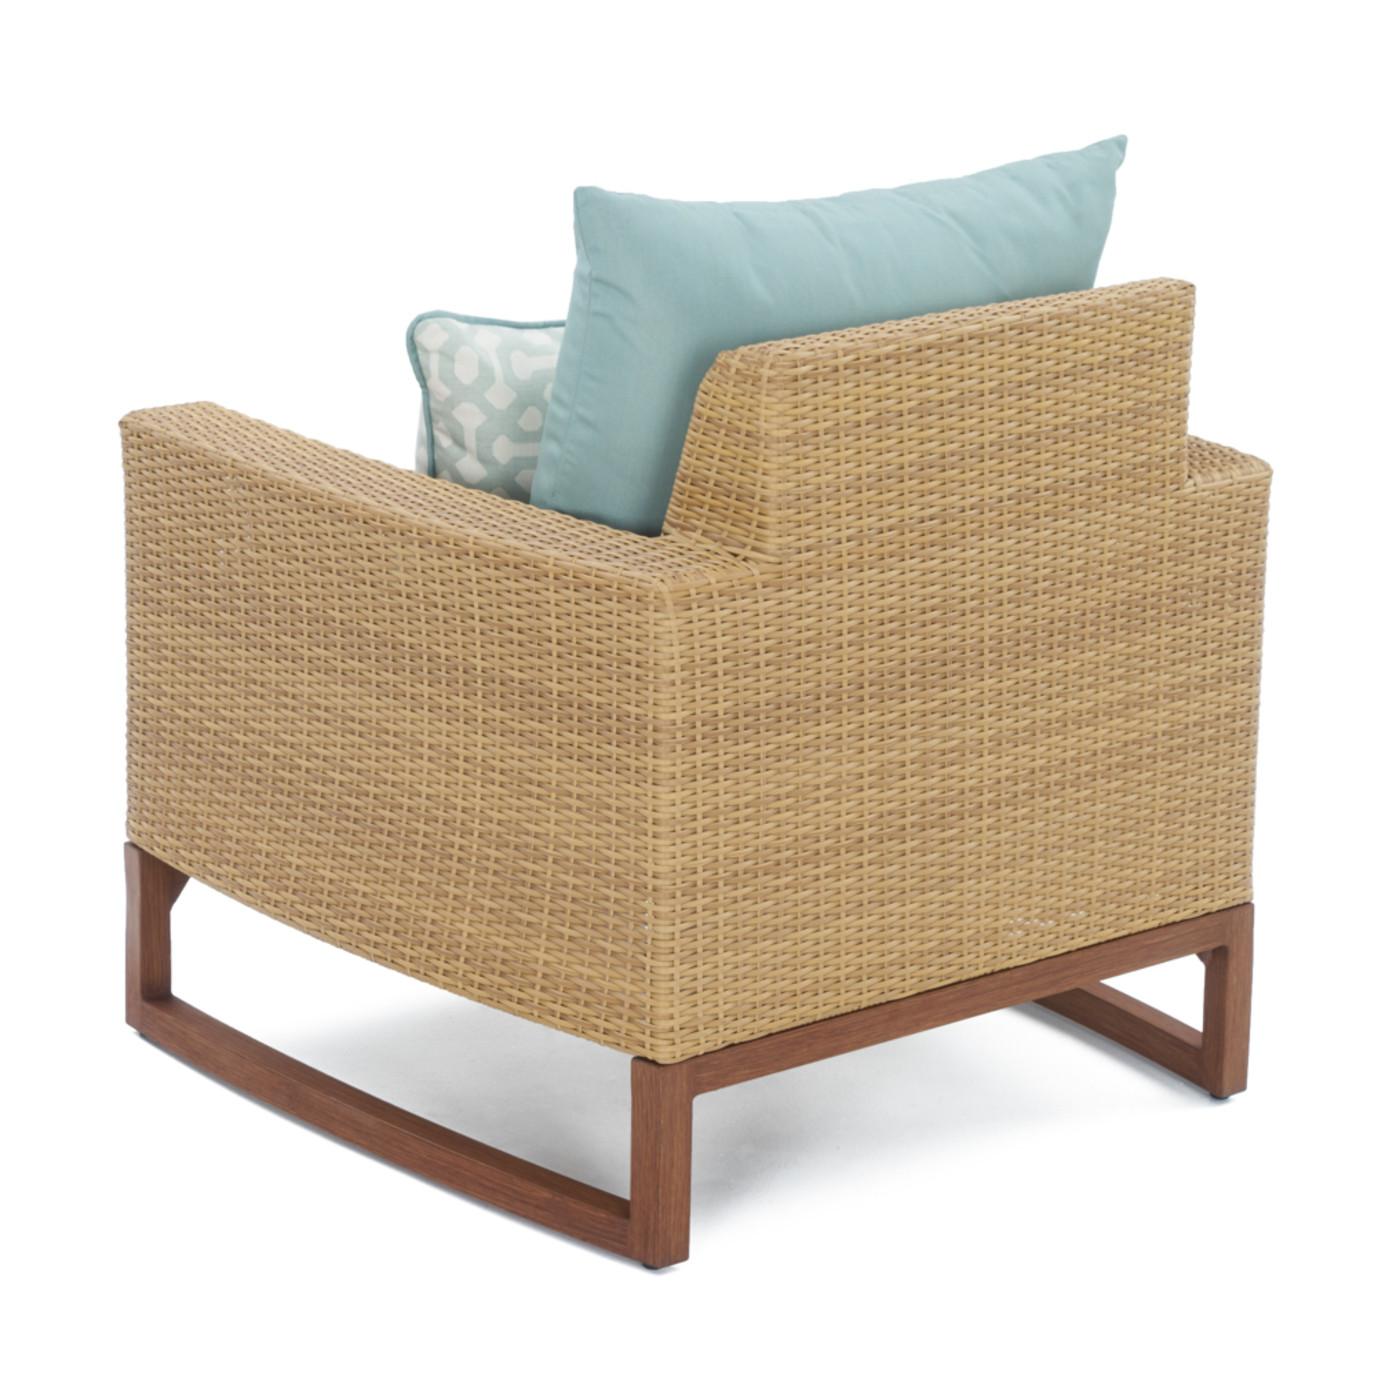 Mili™ 5 Piece Club Chair & Ottoman Set - Spa Blue